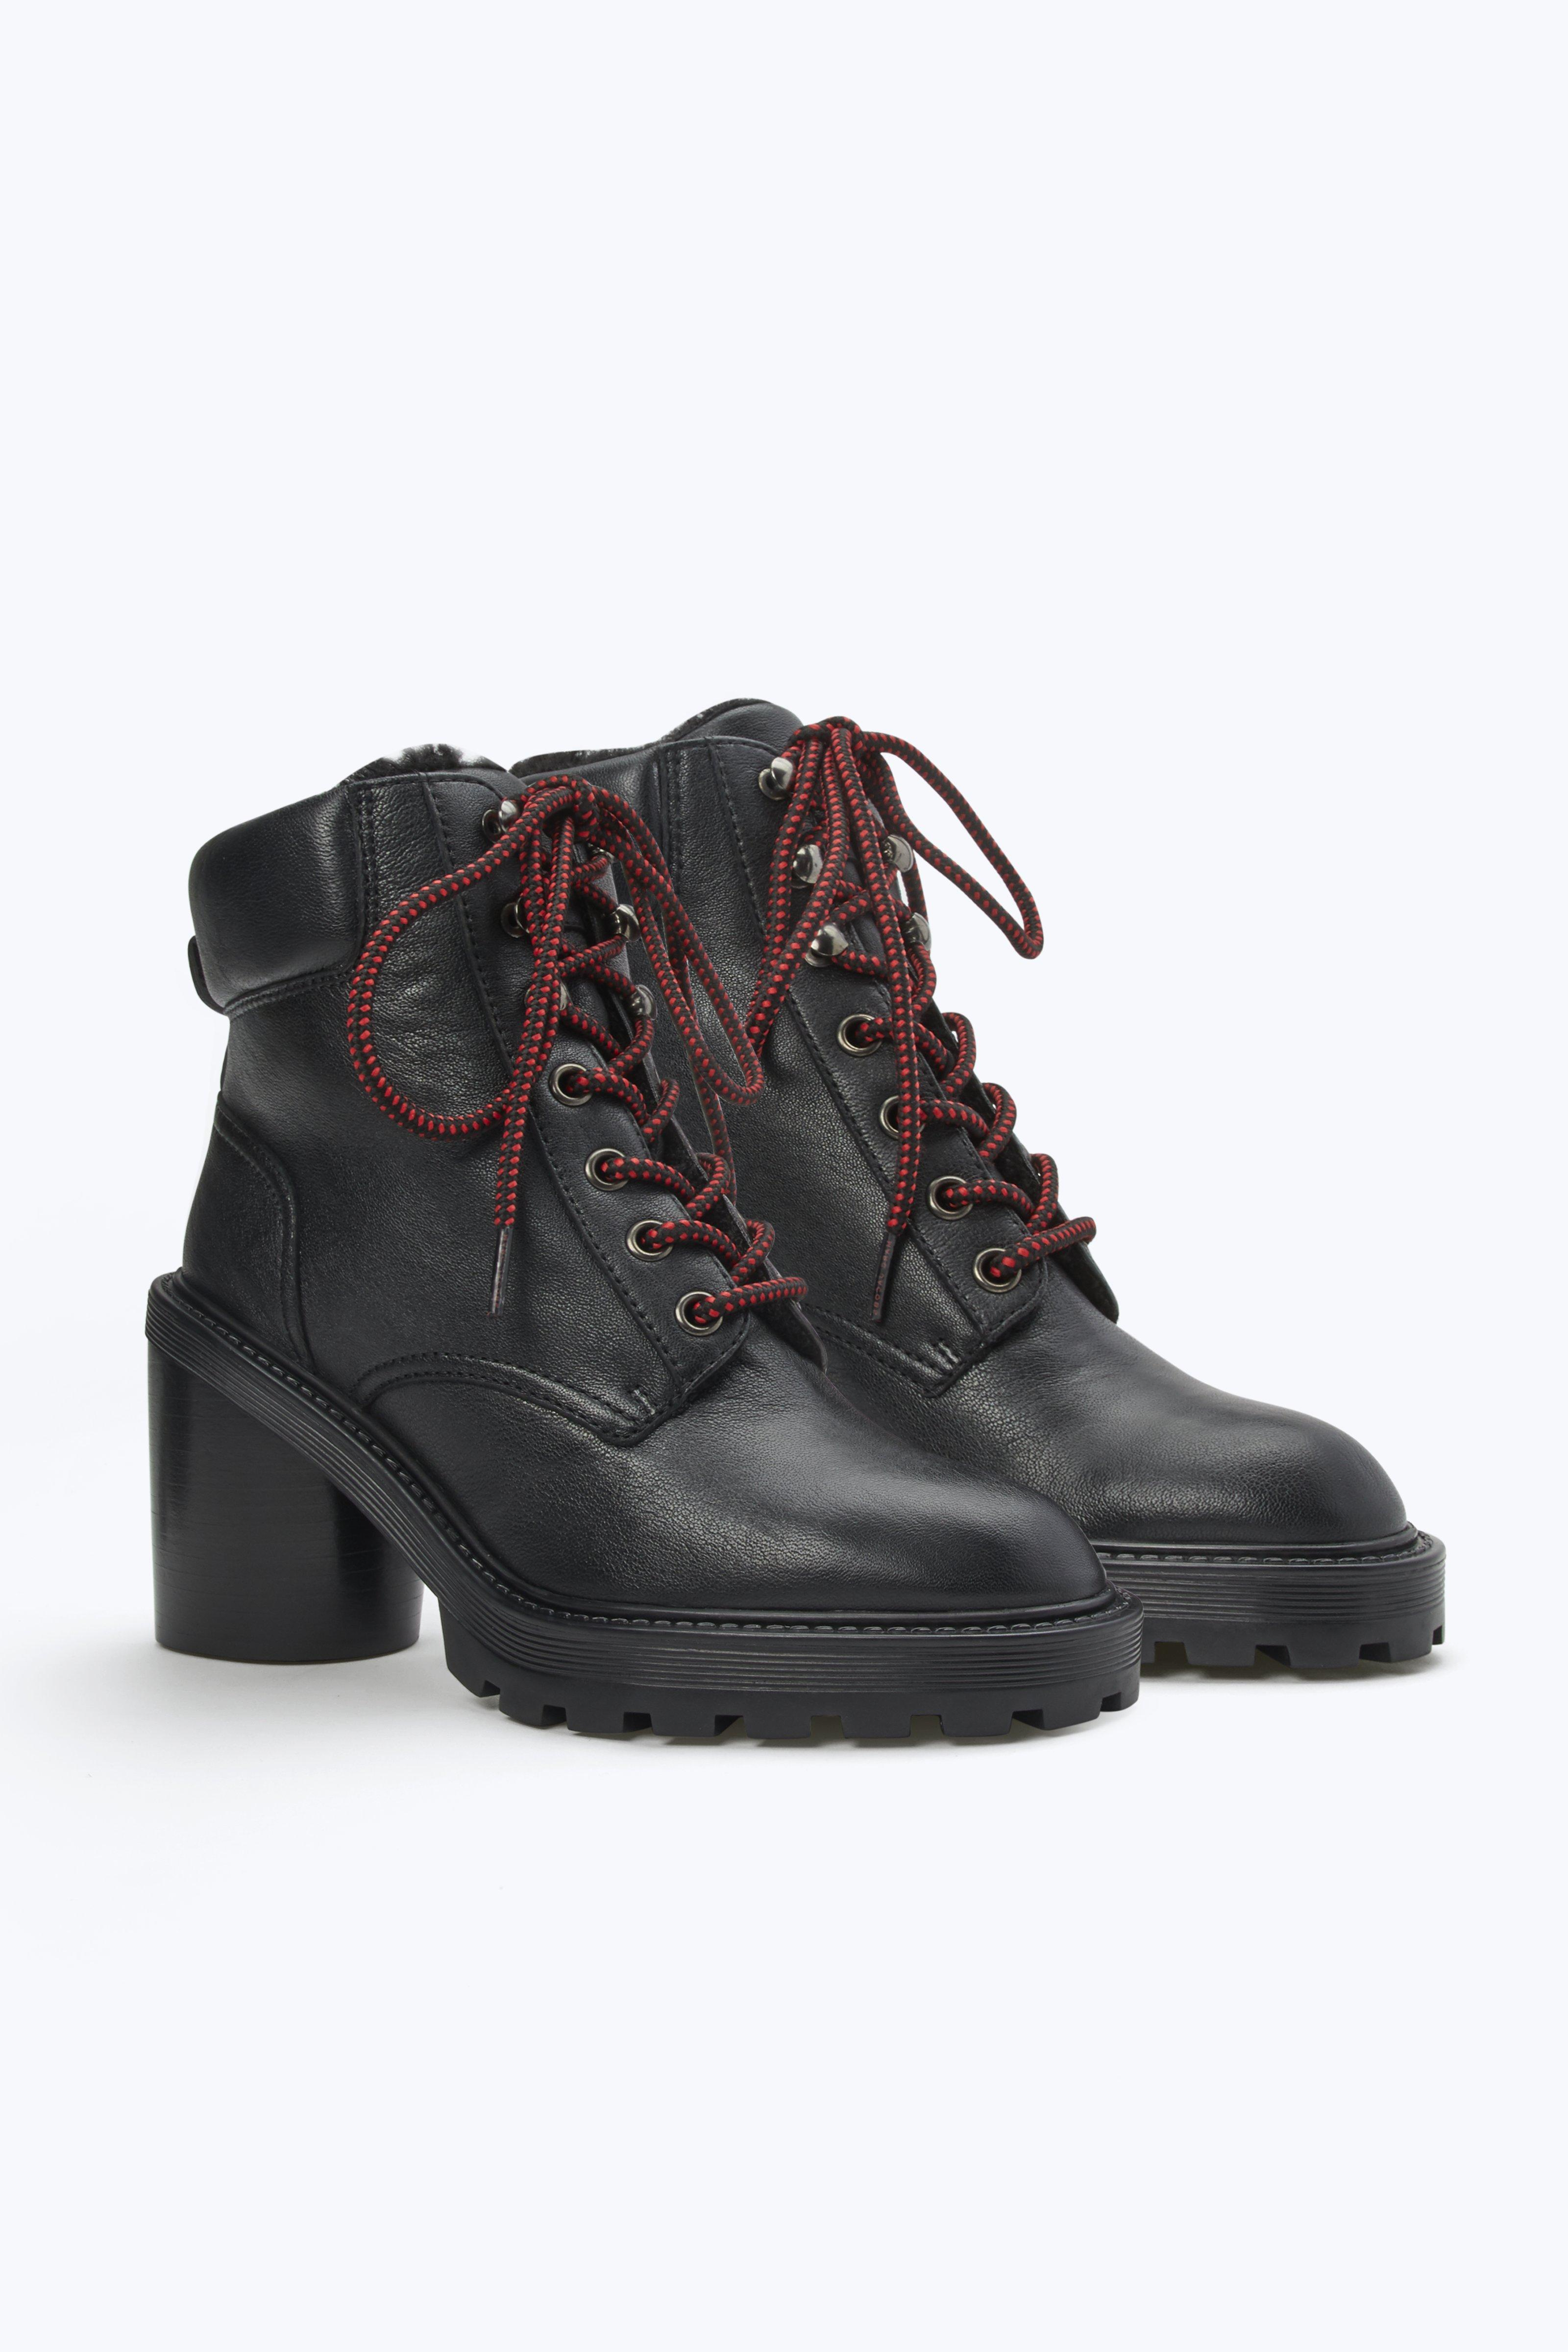 winter sneakers dames 2016